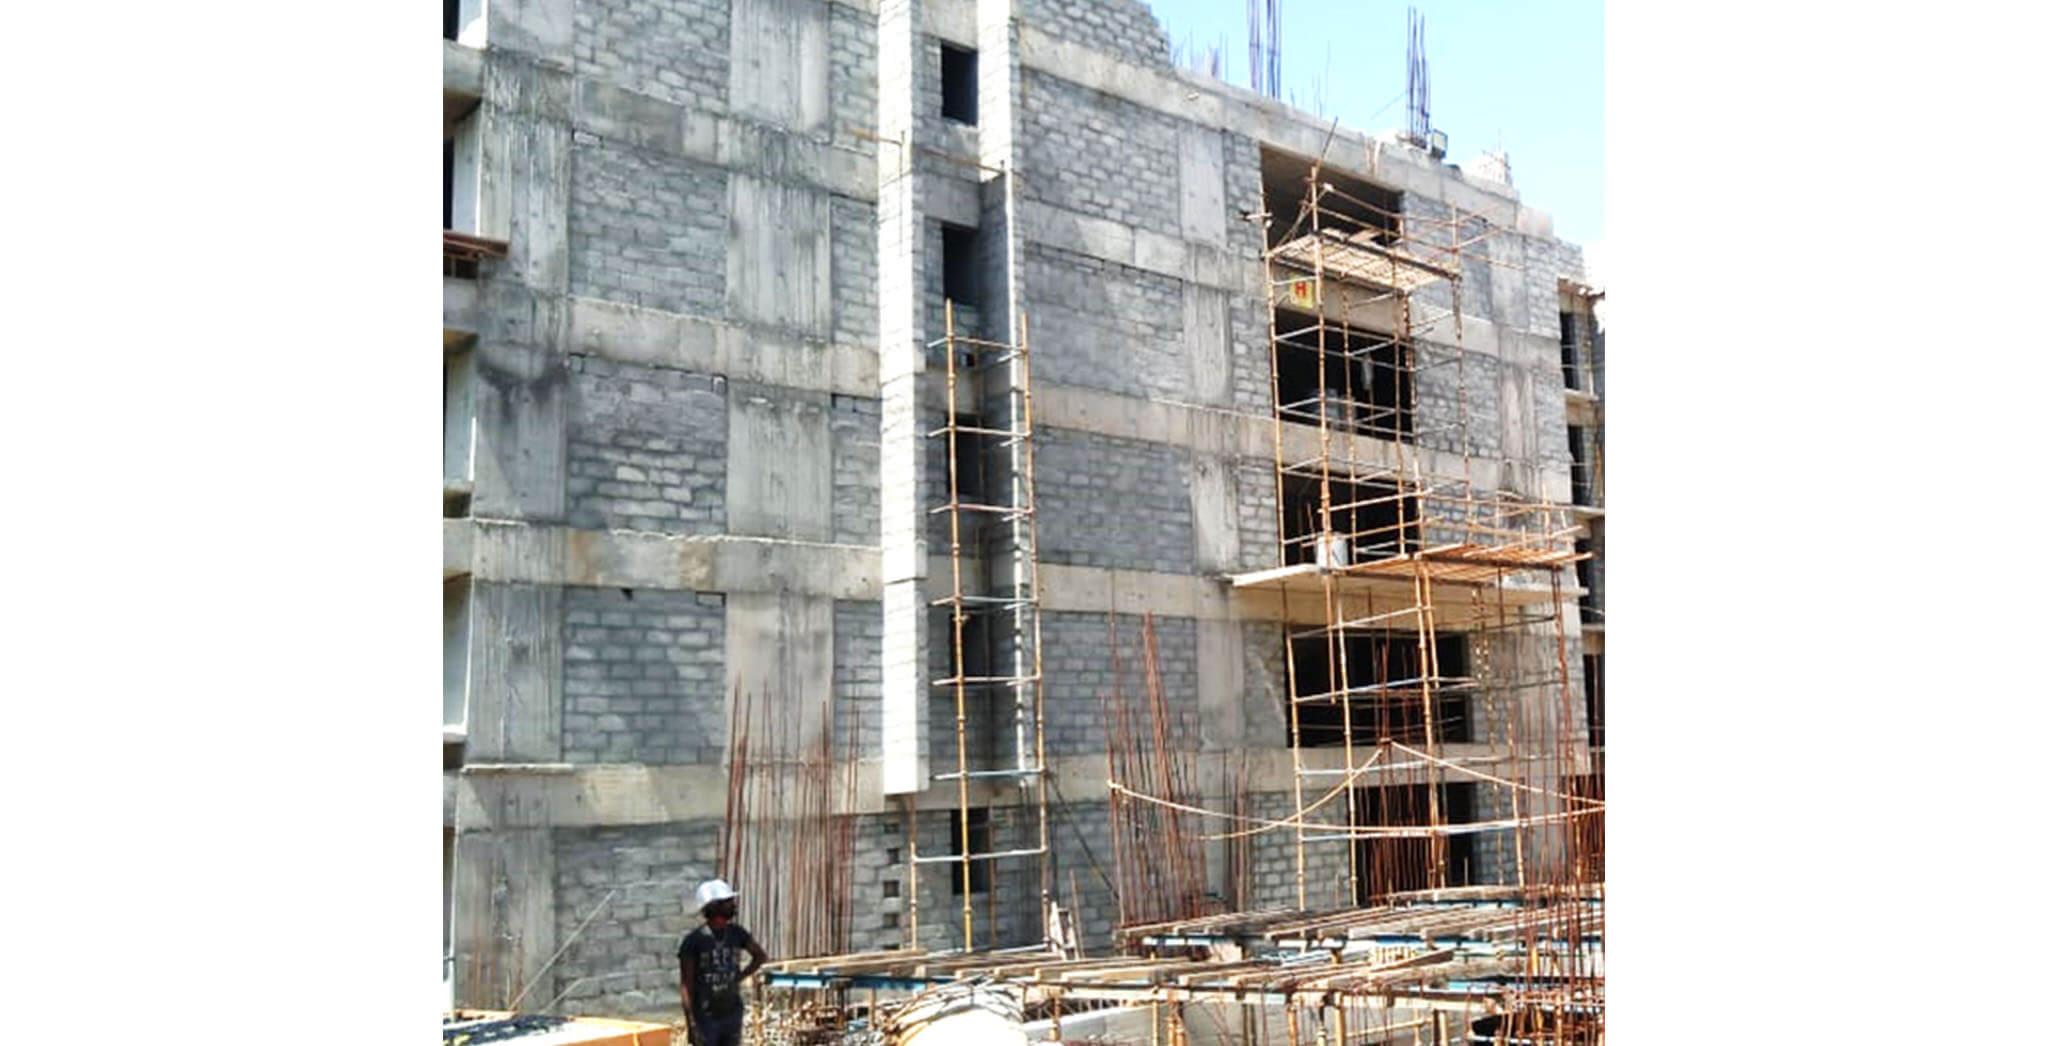 Aug 2020 - H Block: 3rd floor internal plastering work-in-progress; 1st floor toilet  waterproofing completed.